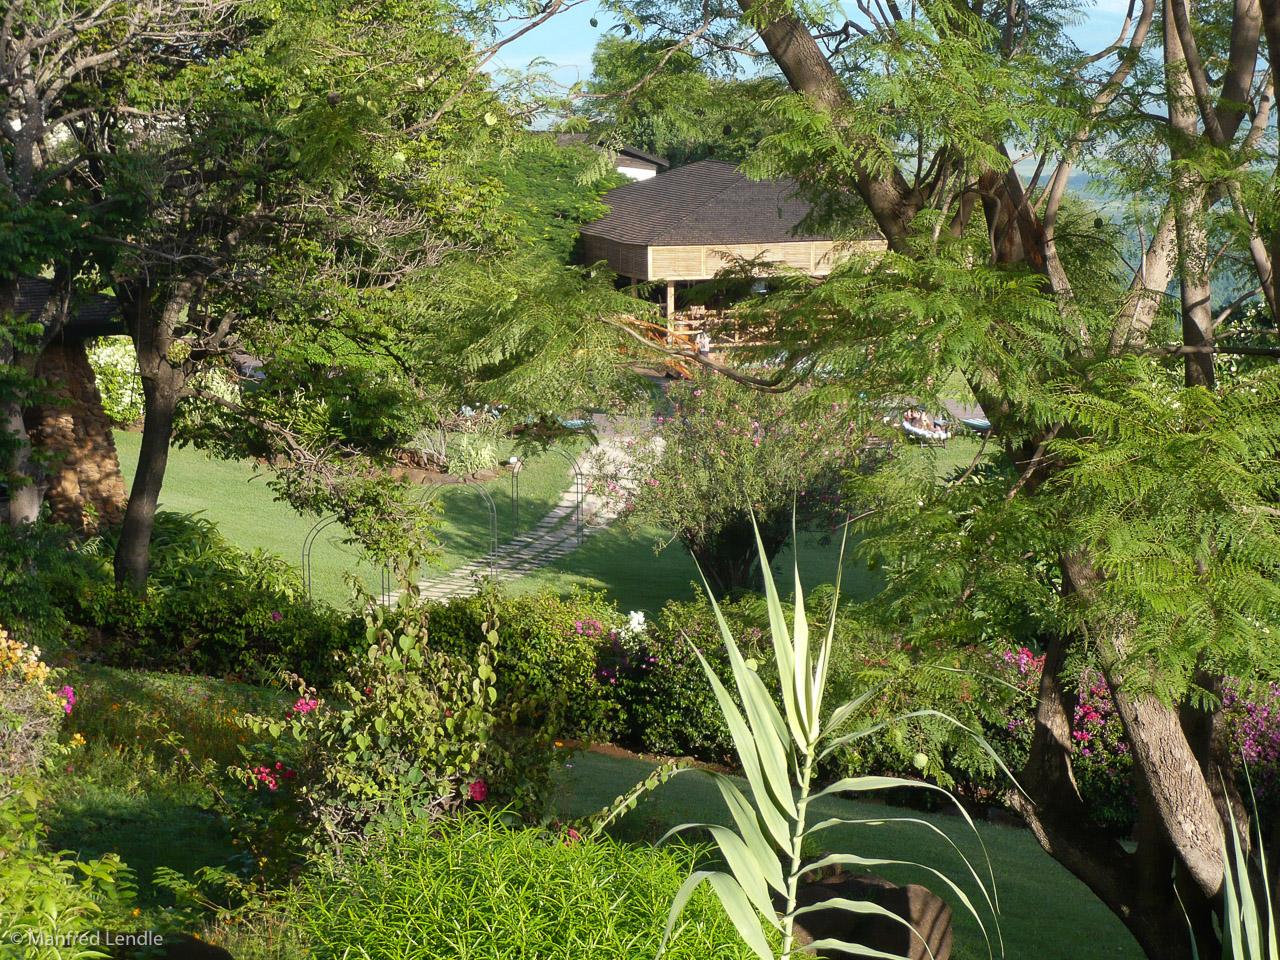 Tansania_2009-1060636.jpg